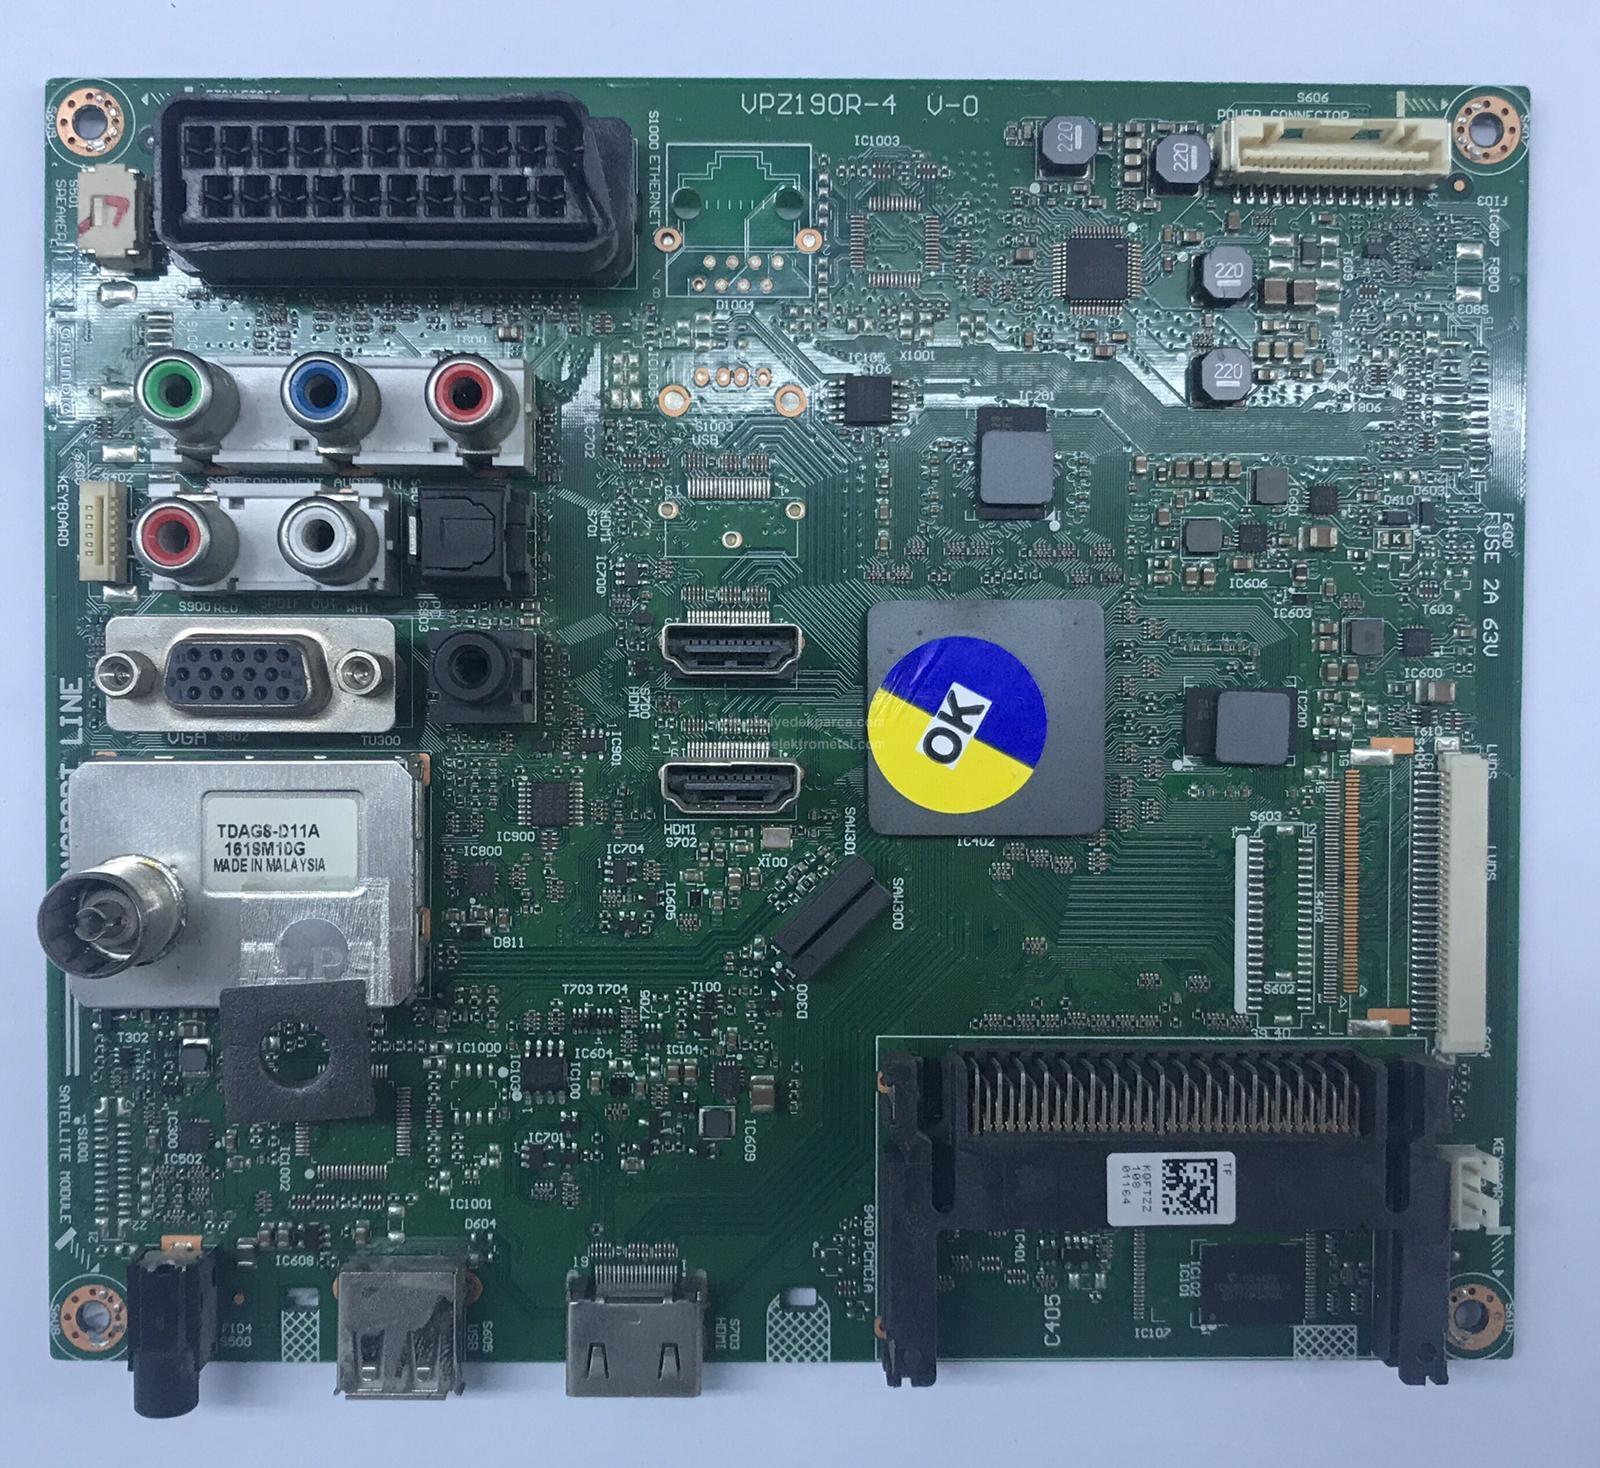 VPZ190R-4 , V-0 , KQFTZZ , ARÇELİK , LTA320AN01 , F82-210 , Main Board , Ana Kart